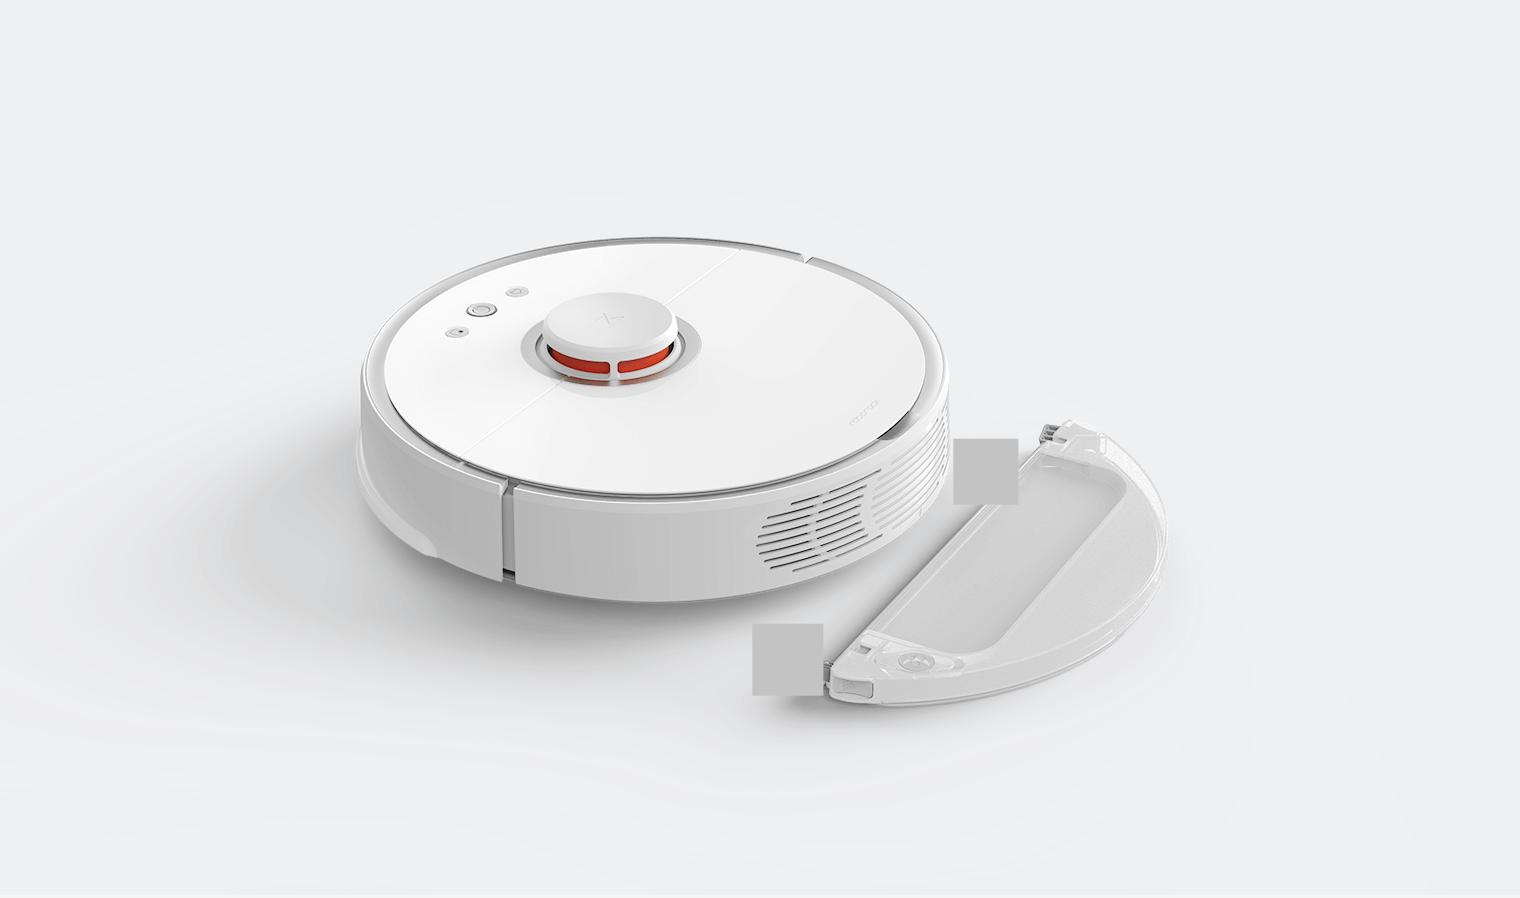 Review: Roborock Smart Sweep-n-Mop Vacuum Cleaner